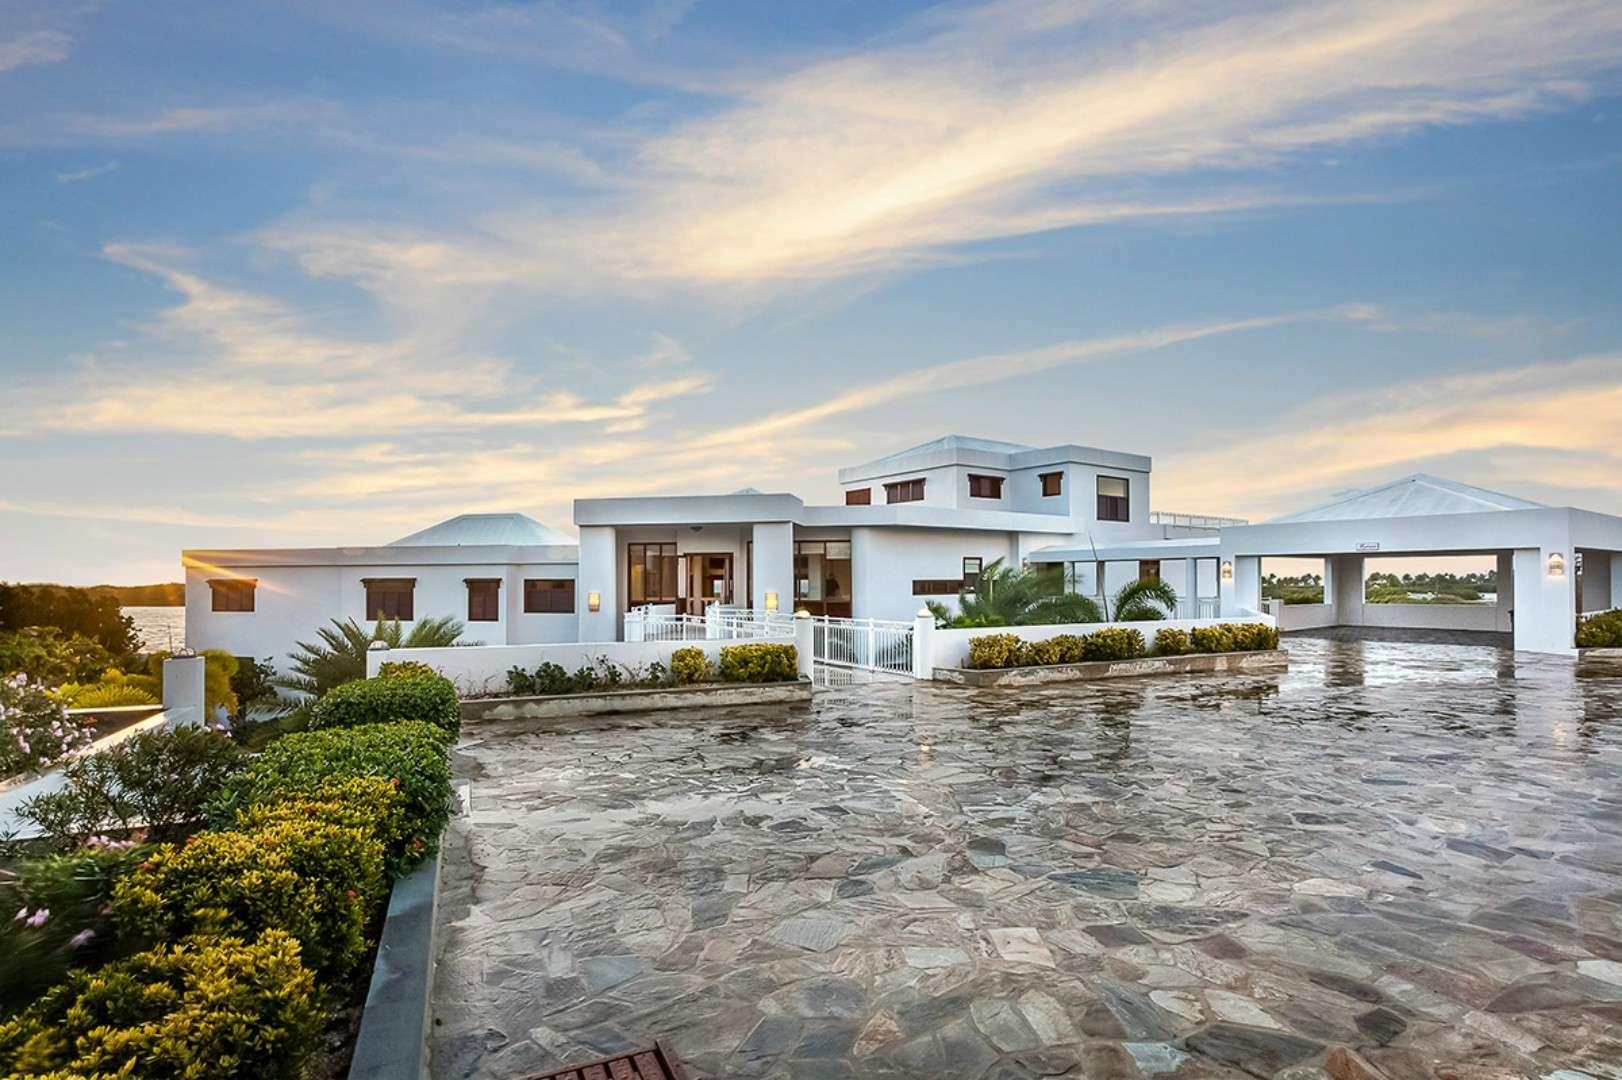 Luxury villa rentals caribbean - Anguilla - West endvillage - No location 4 - Sheriva Mystique - Image 1/12